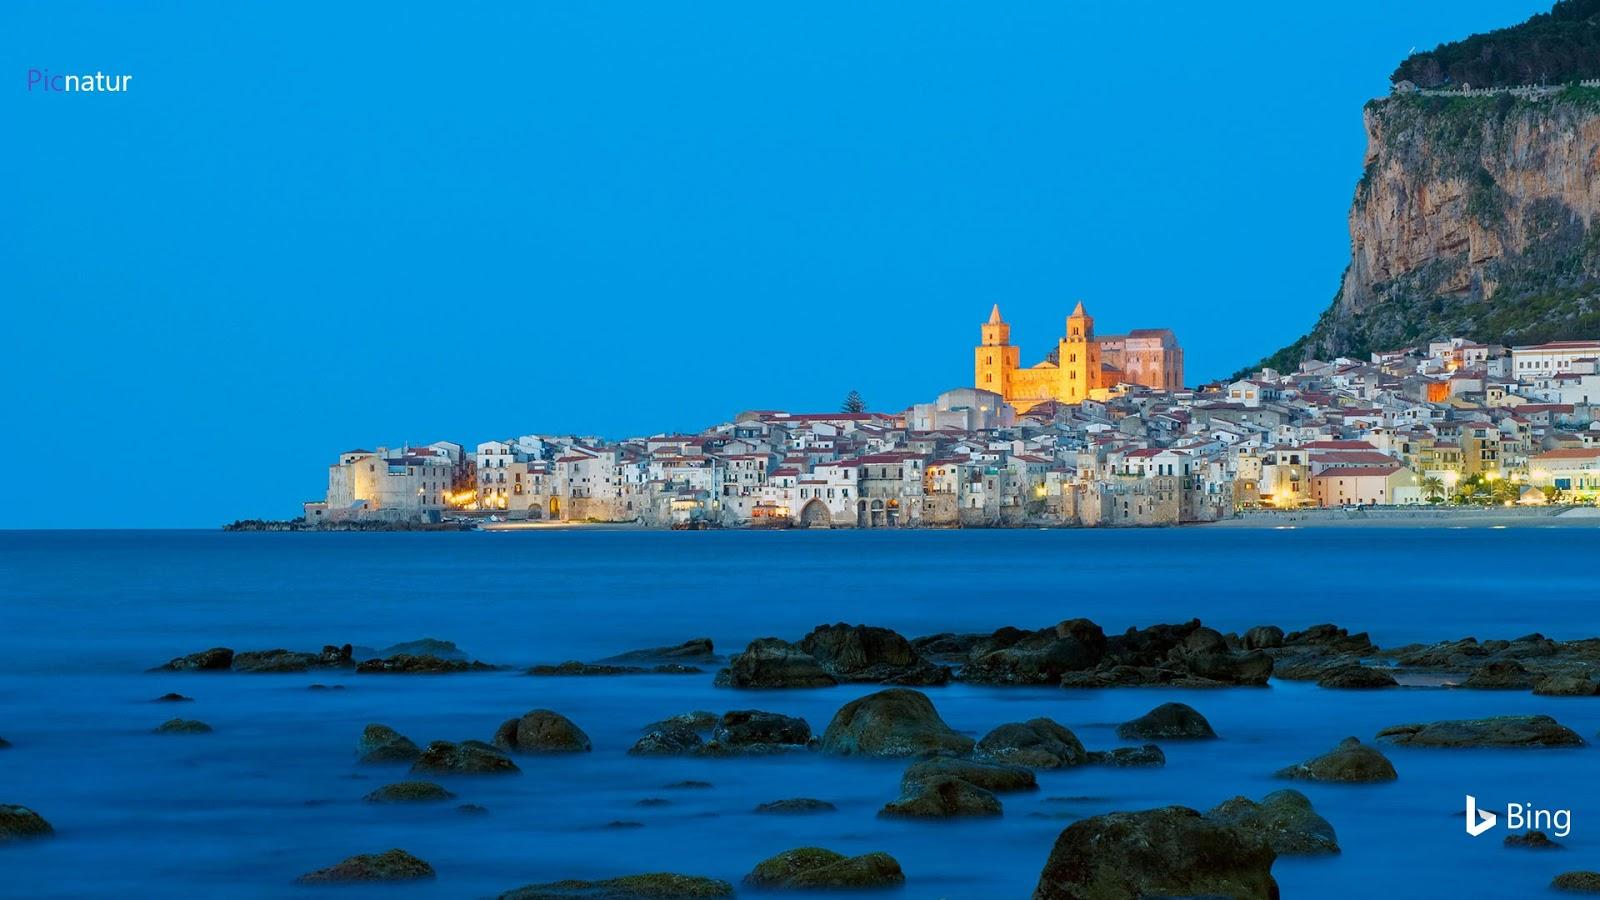 Cefalù on the Tyrrhenian coast in Sicily, Italy © tuul & bruno morandi/eStock Photo